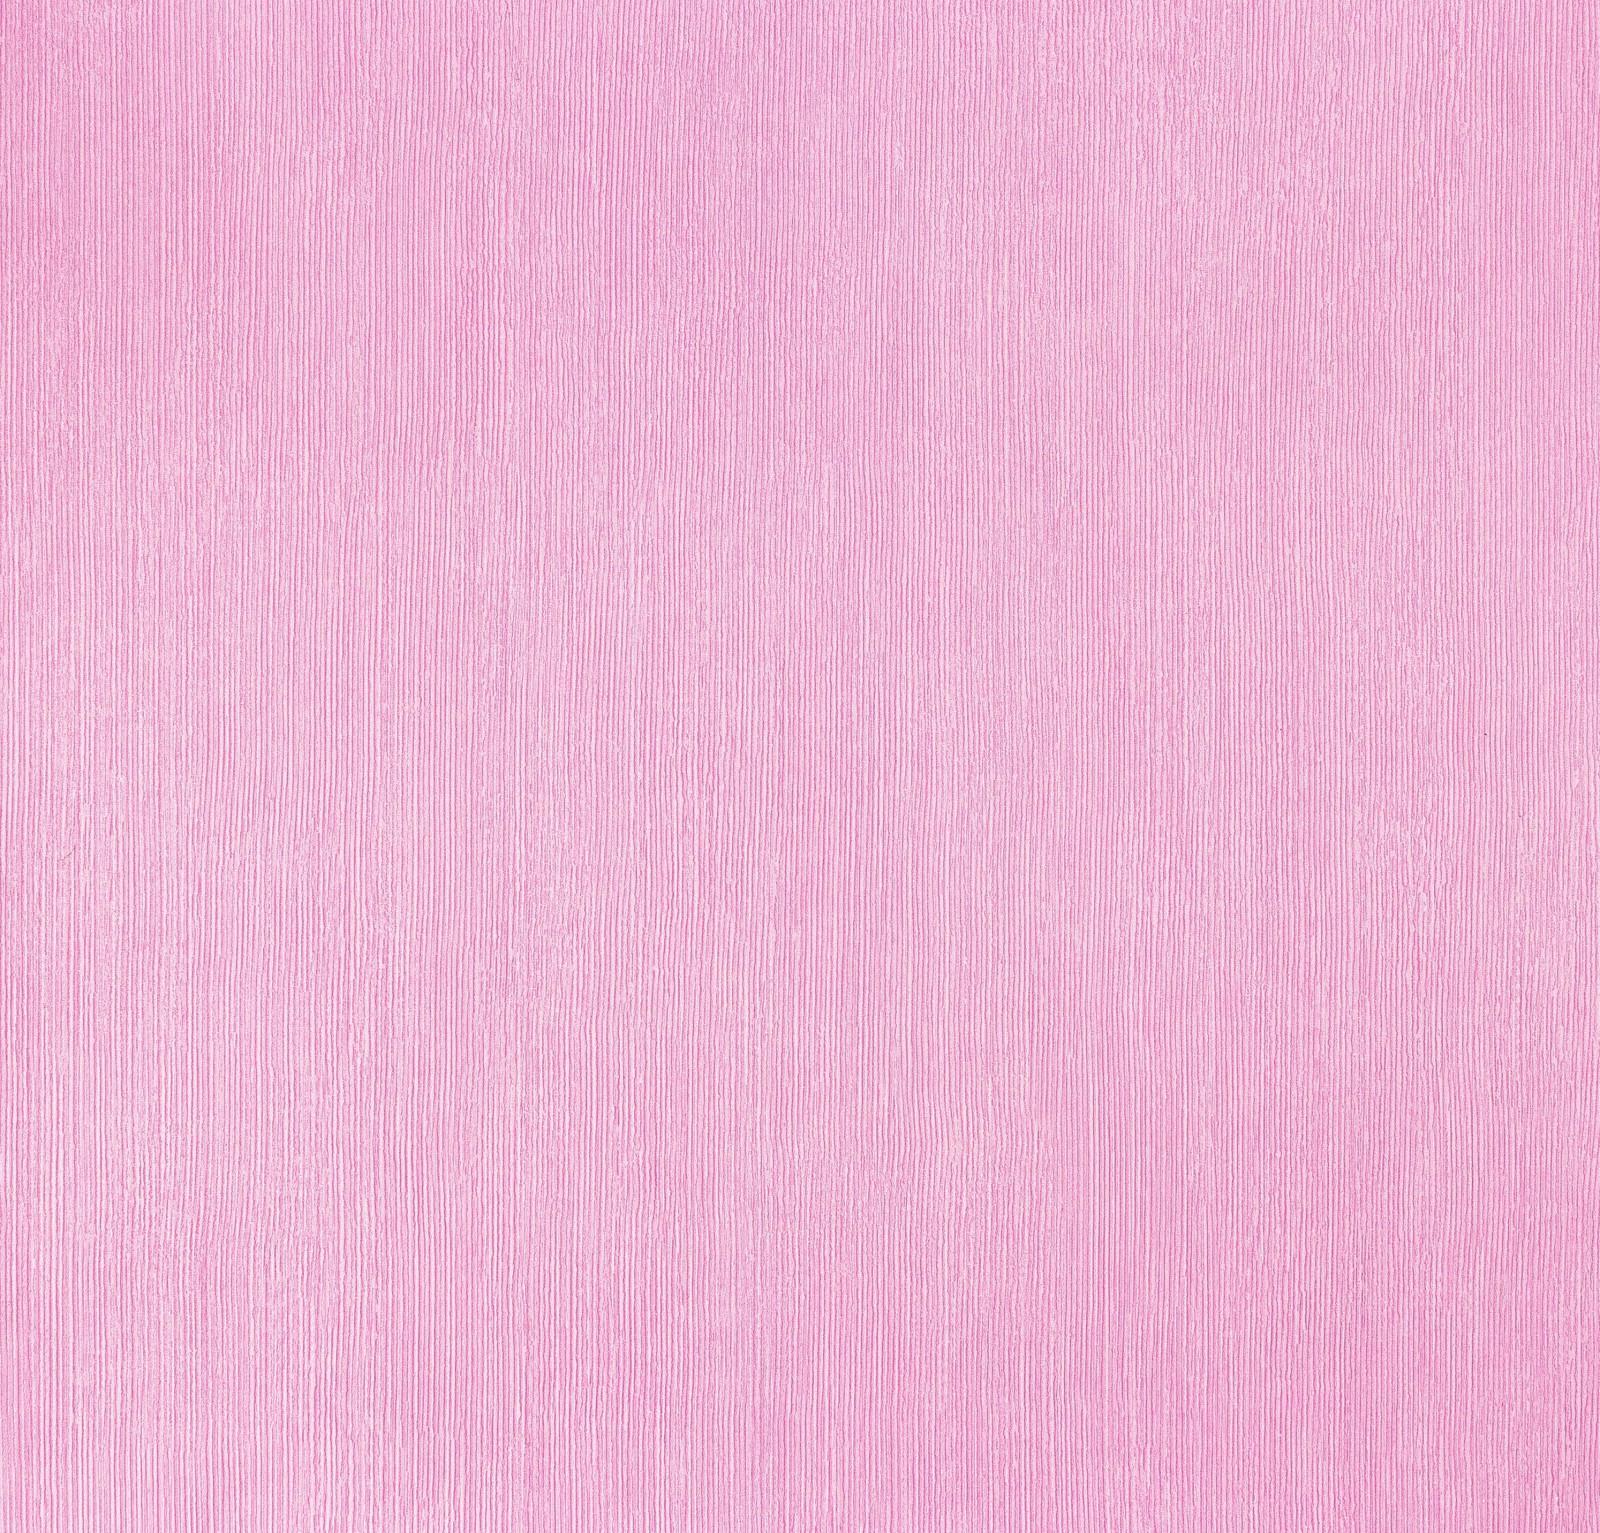 Kids Wallpaper Uni Boys Girls Rose 8981 11 001